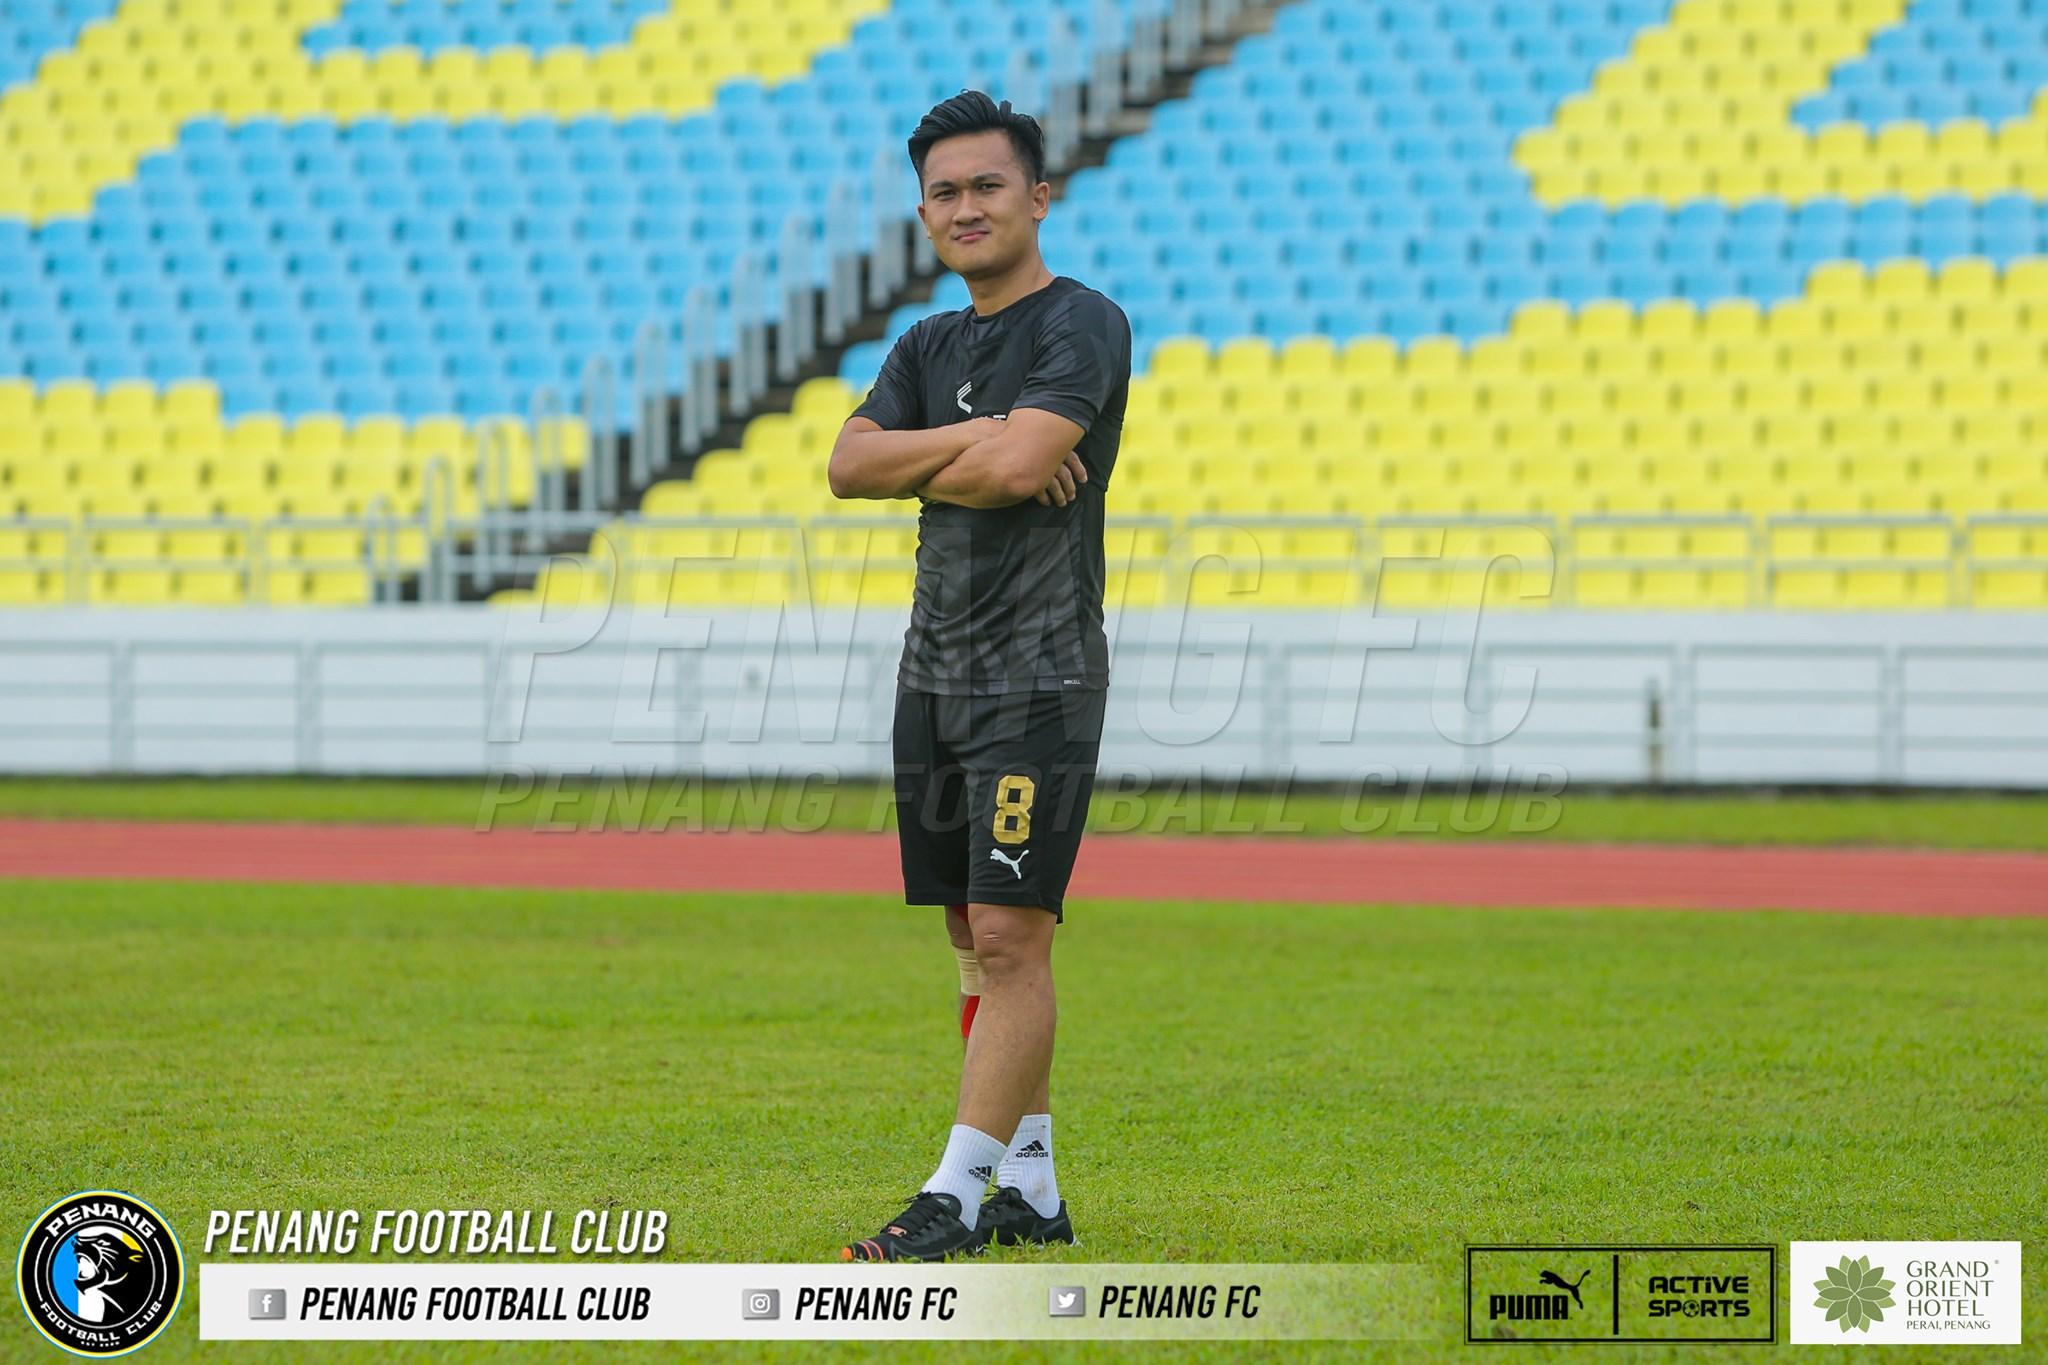 Khairu Azrin Penang